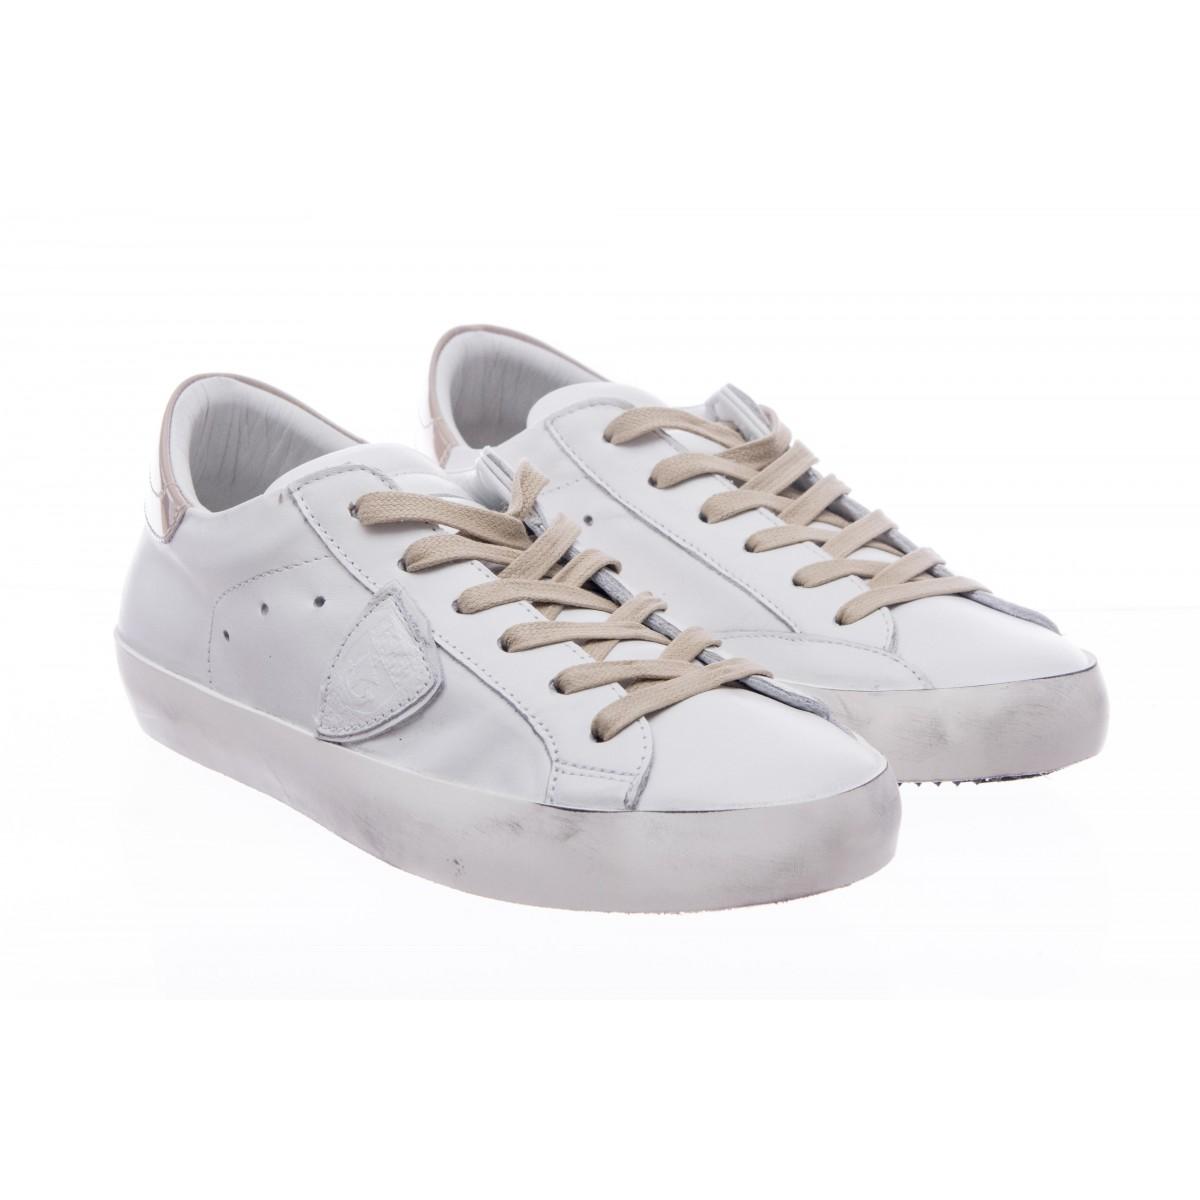 Scarpe - Clld tutta pelle bianca